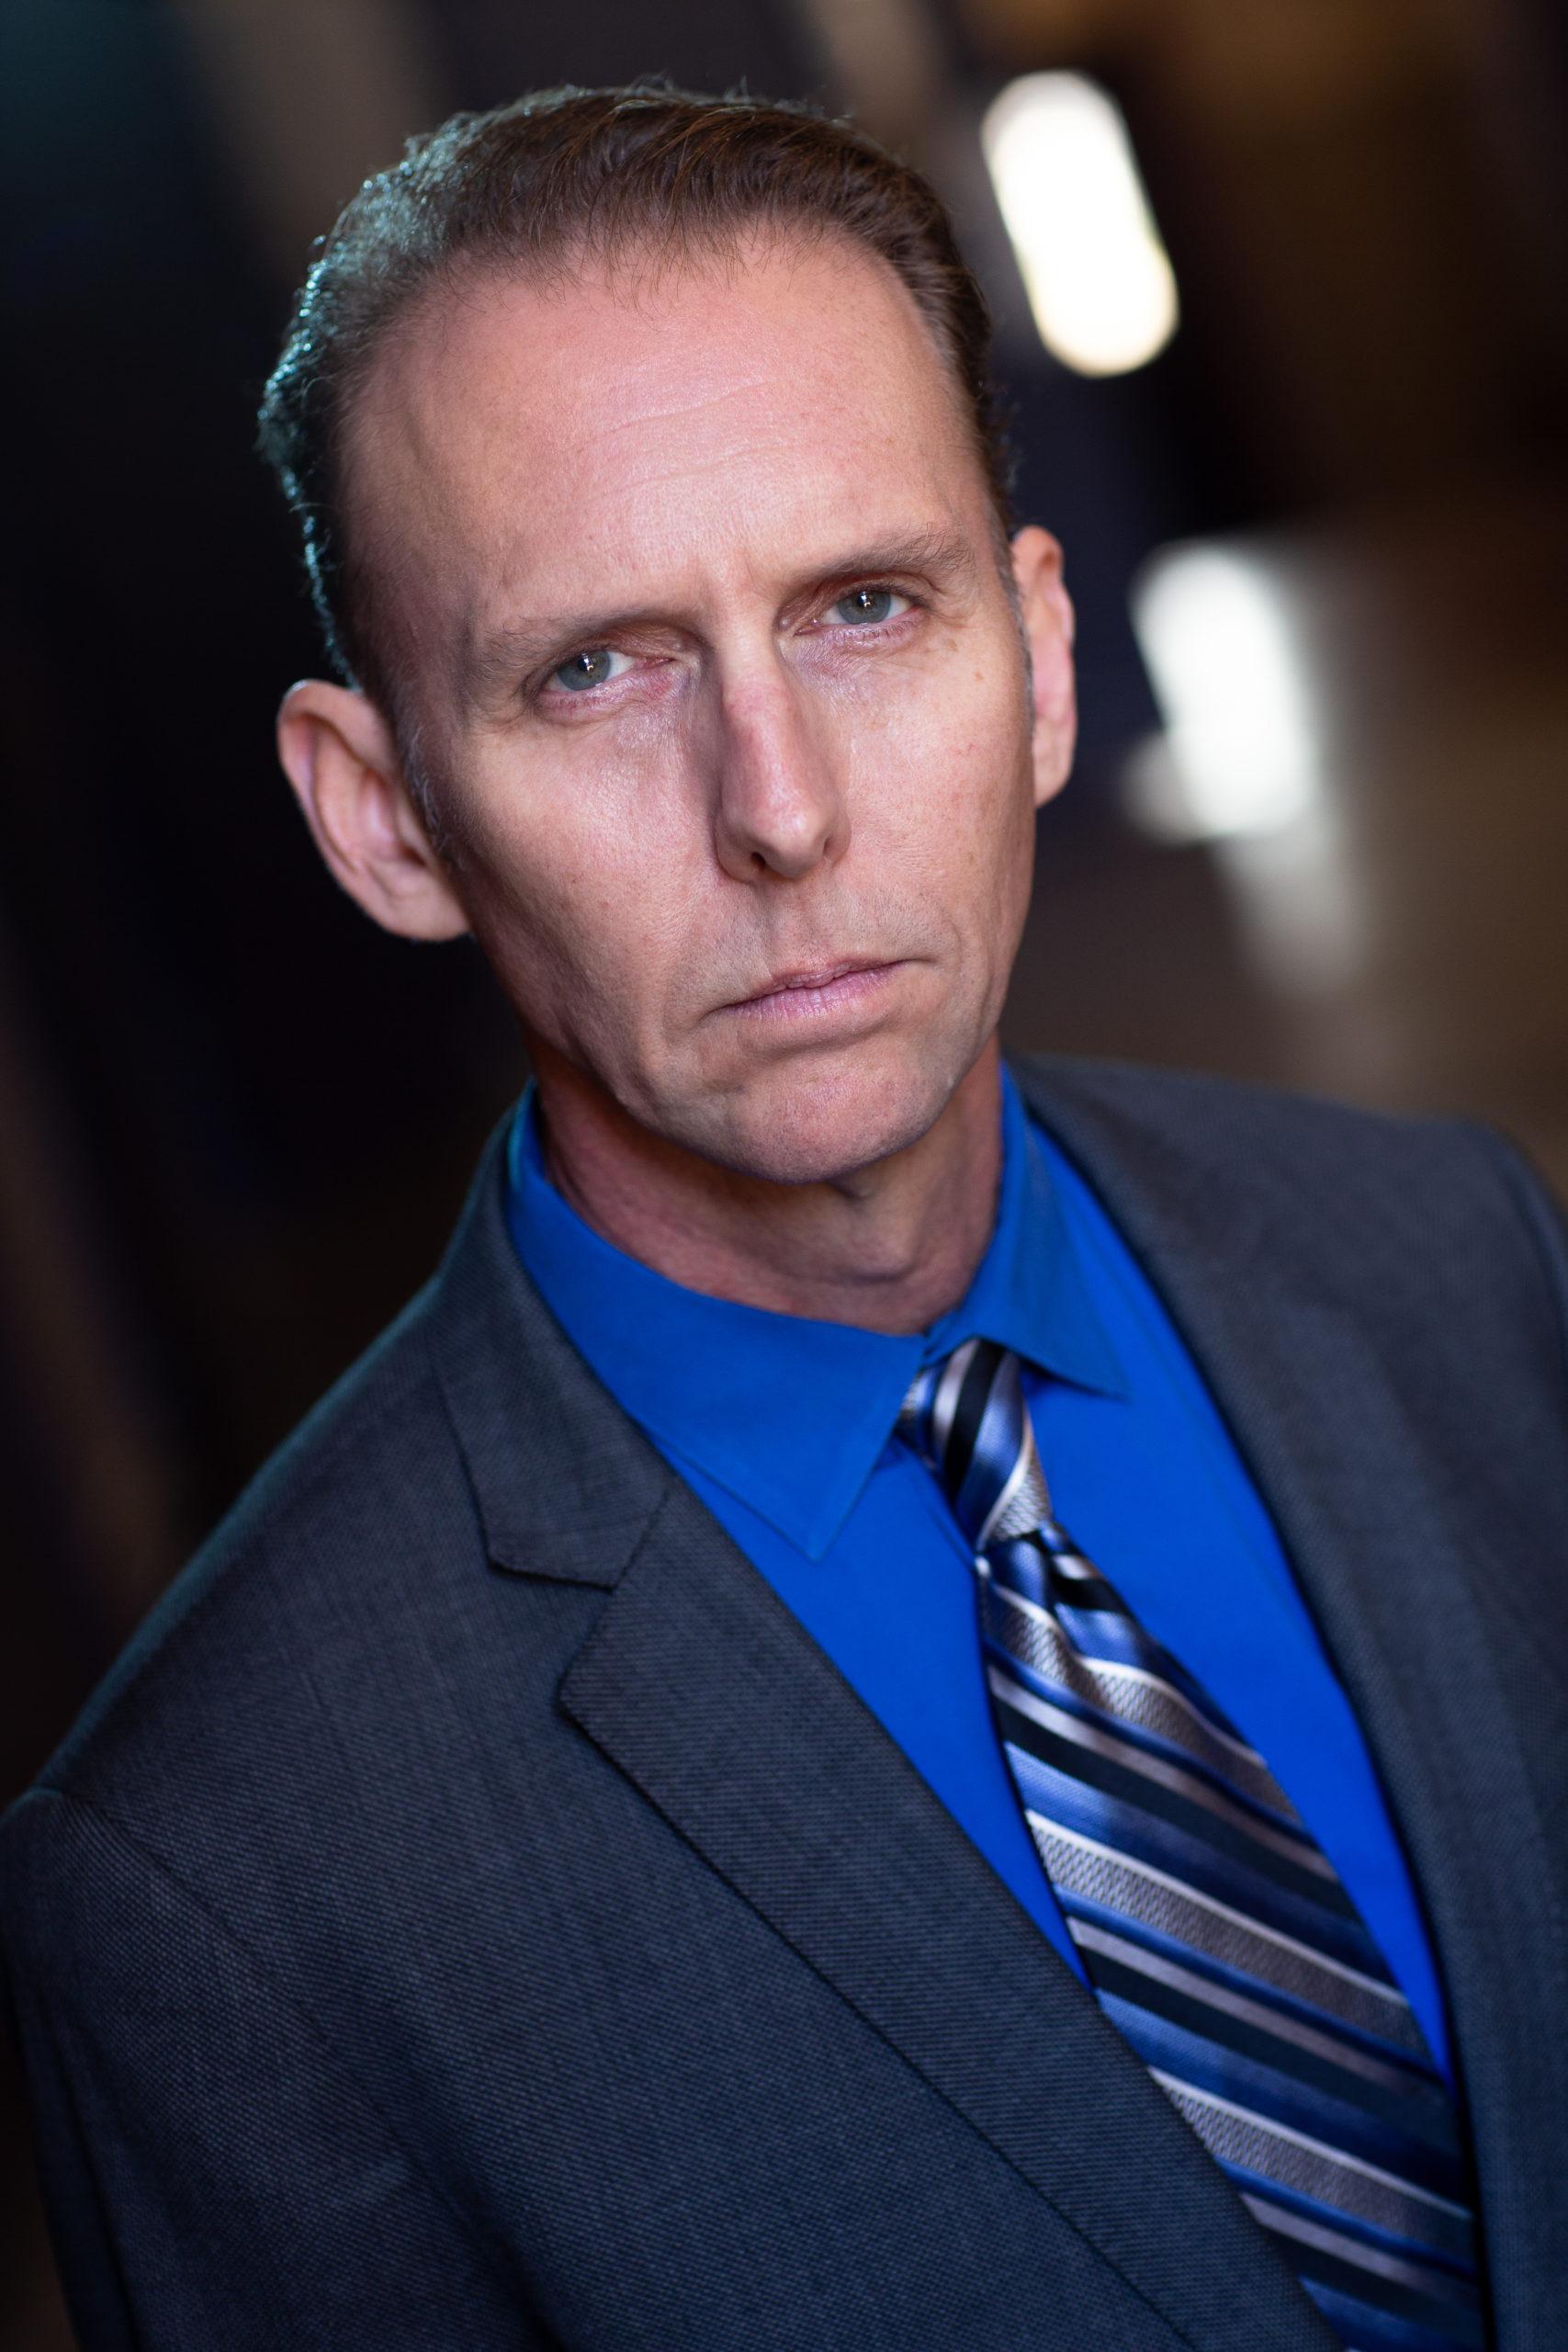 headshots  u2013 actor and teacher  u2013 jayson warner smith